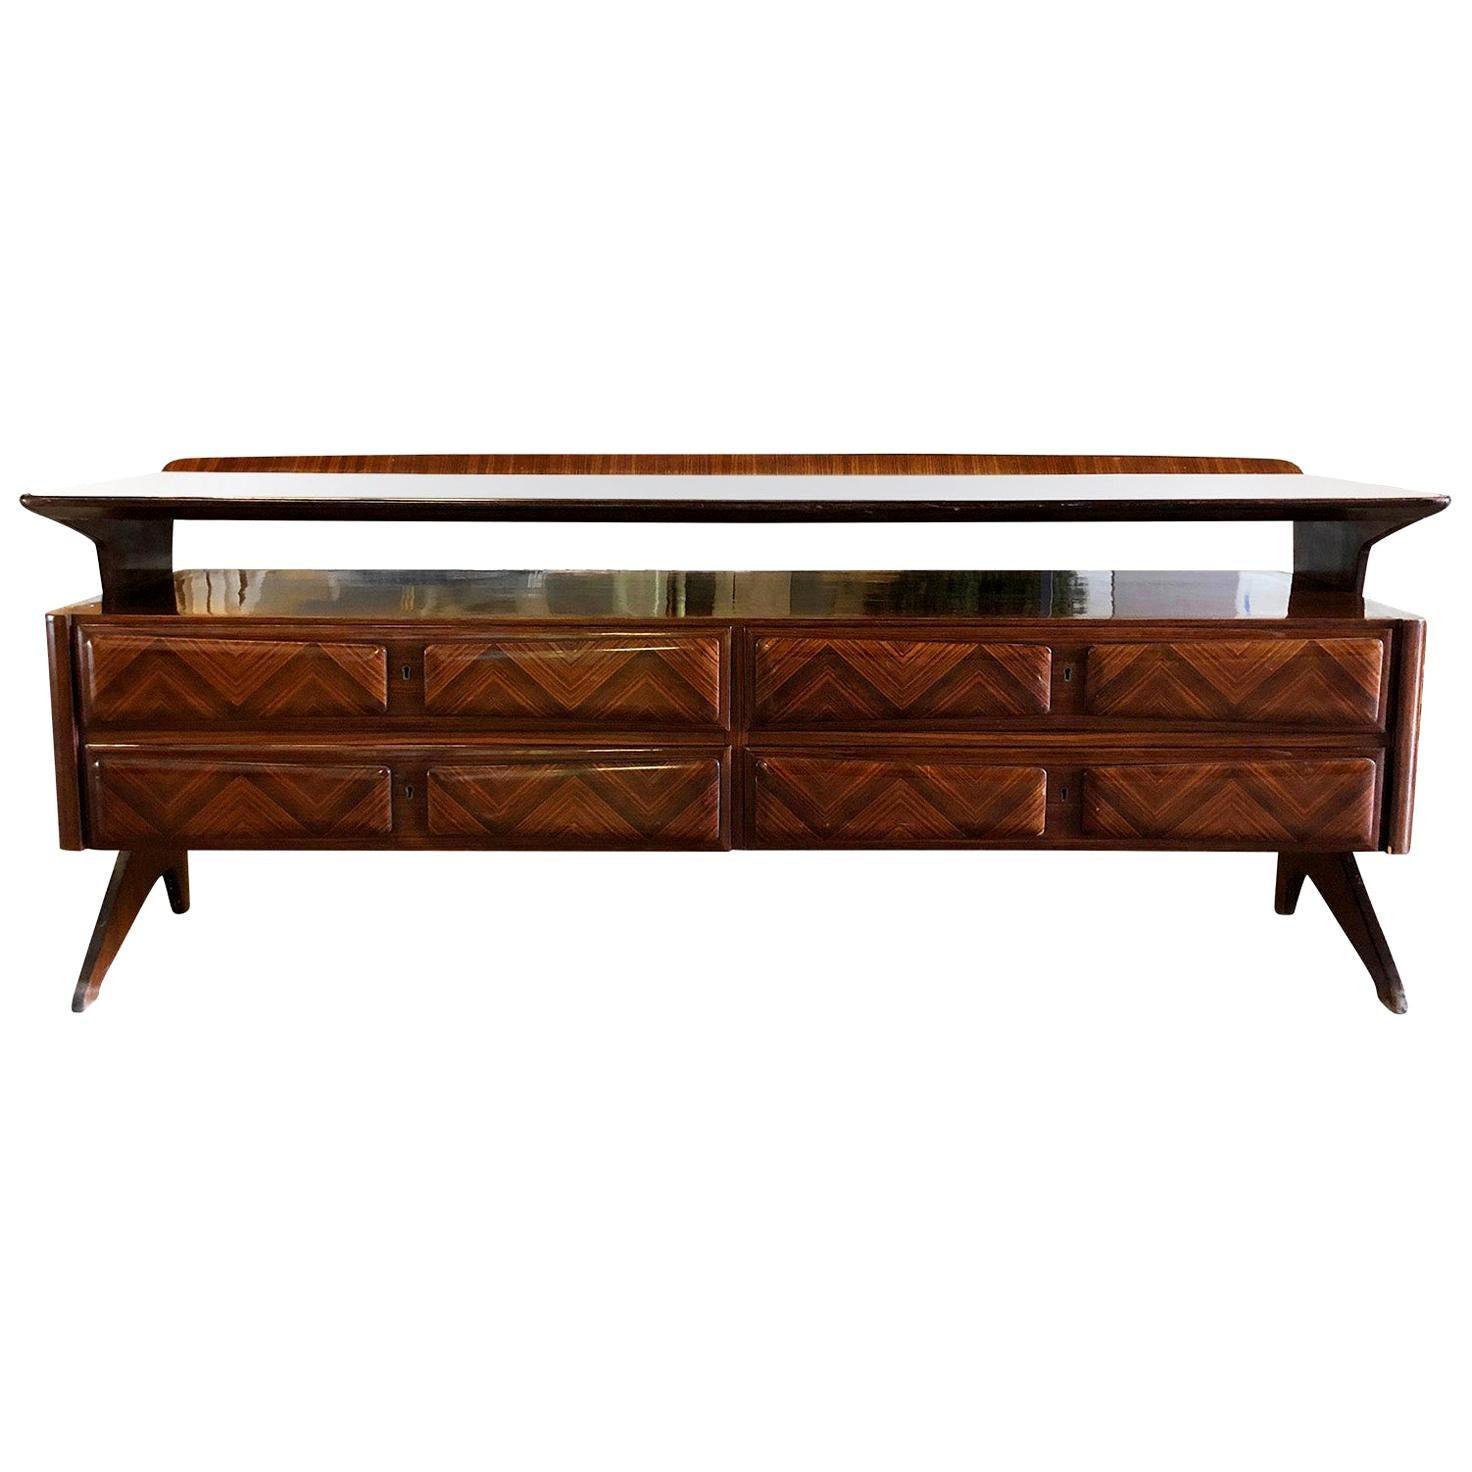 20th Century Italian Credenza, Palisanderwood Sideboard by Vittorio Dassi